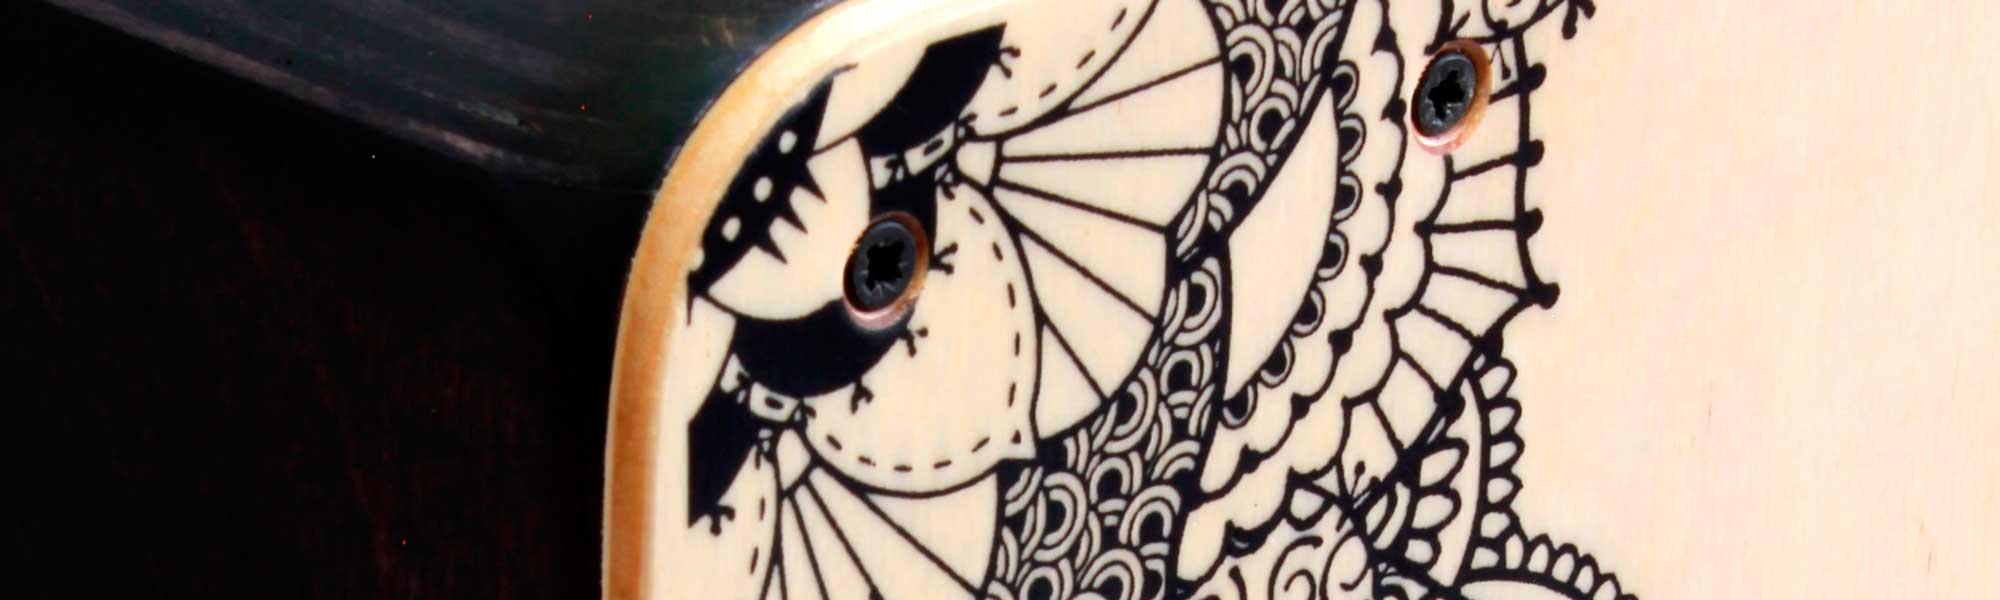 Personaliza tu cajon flamenco